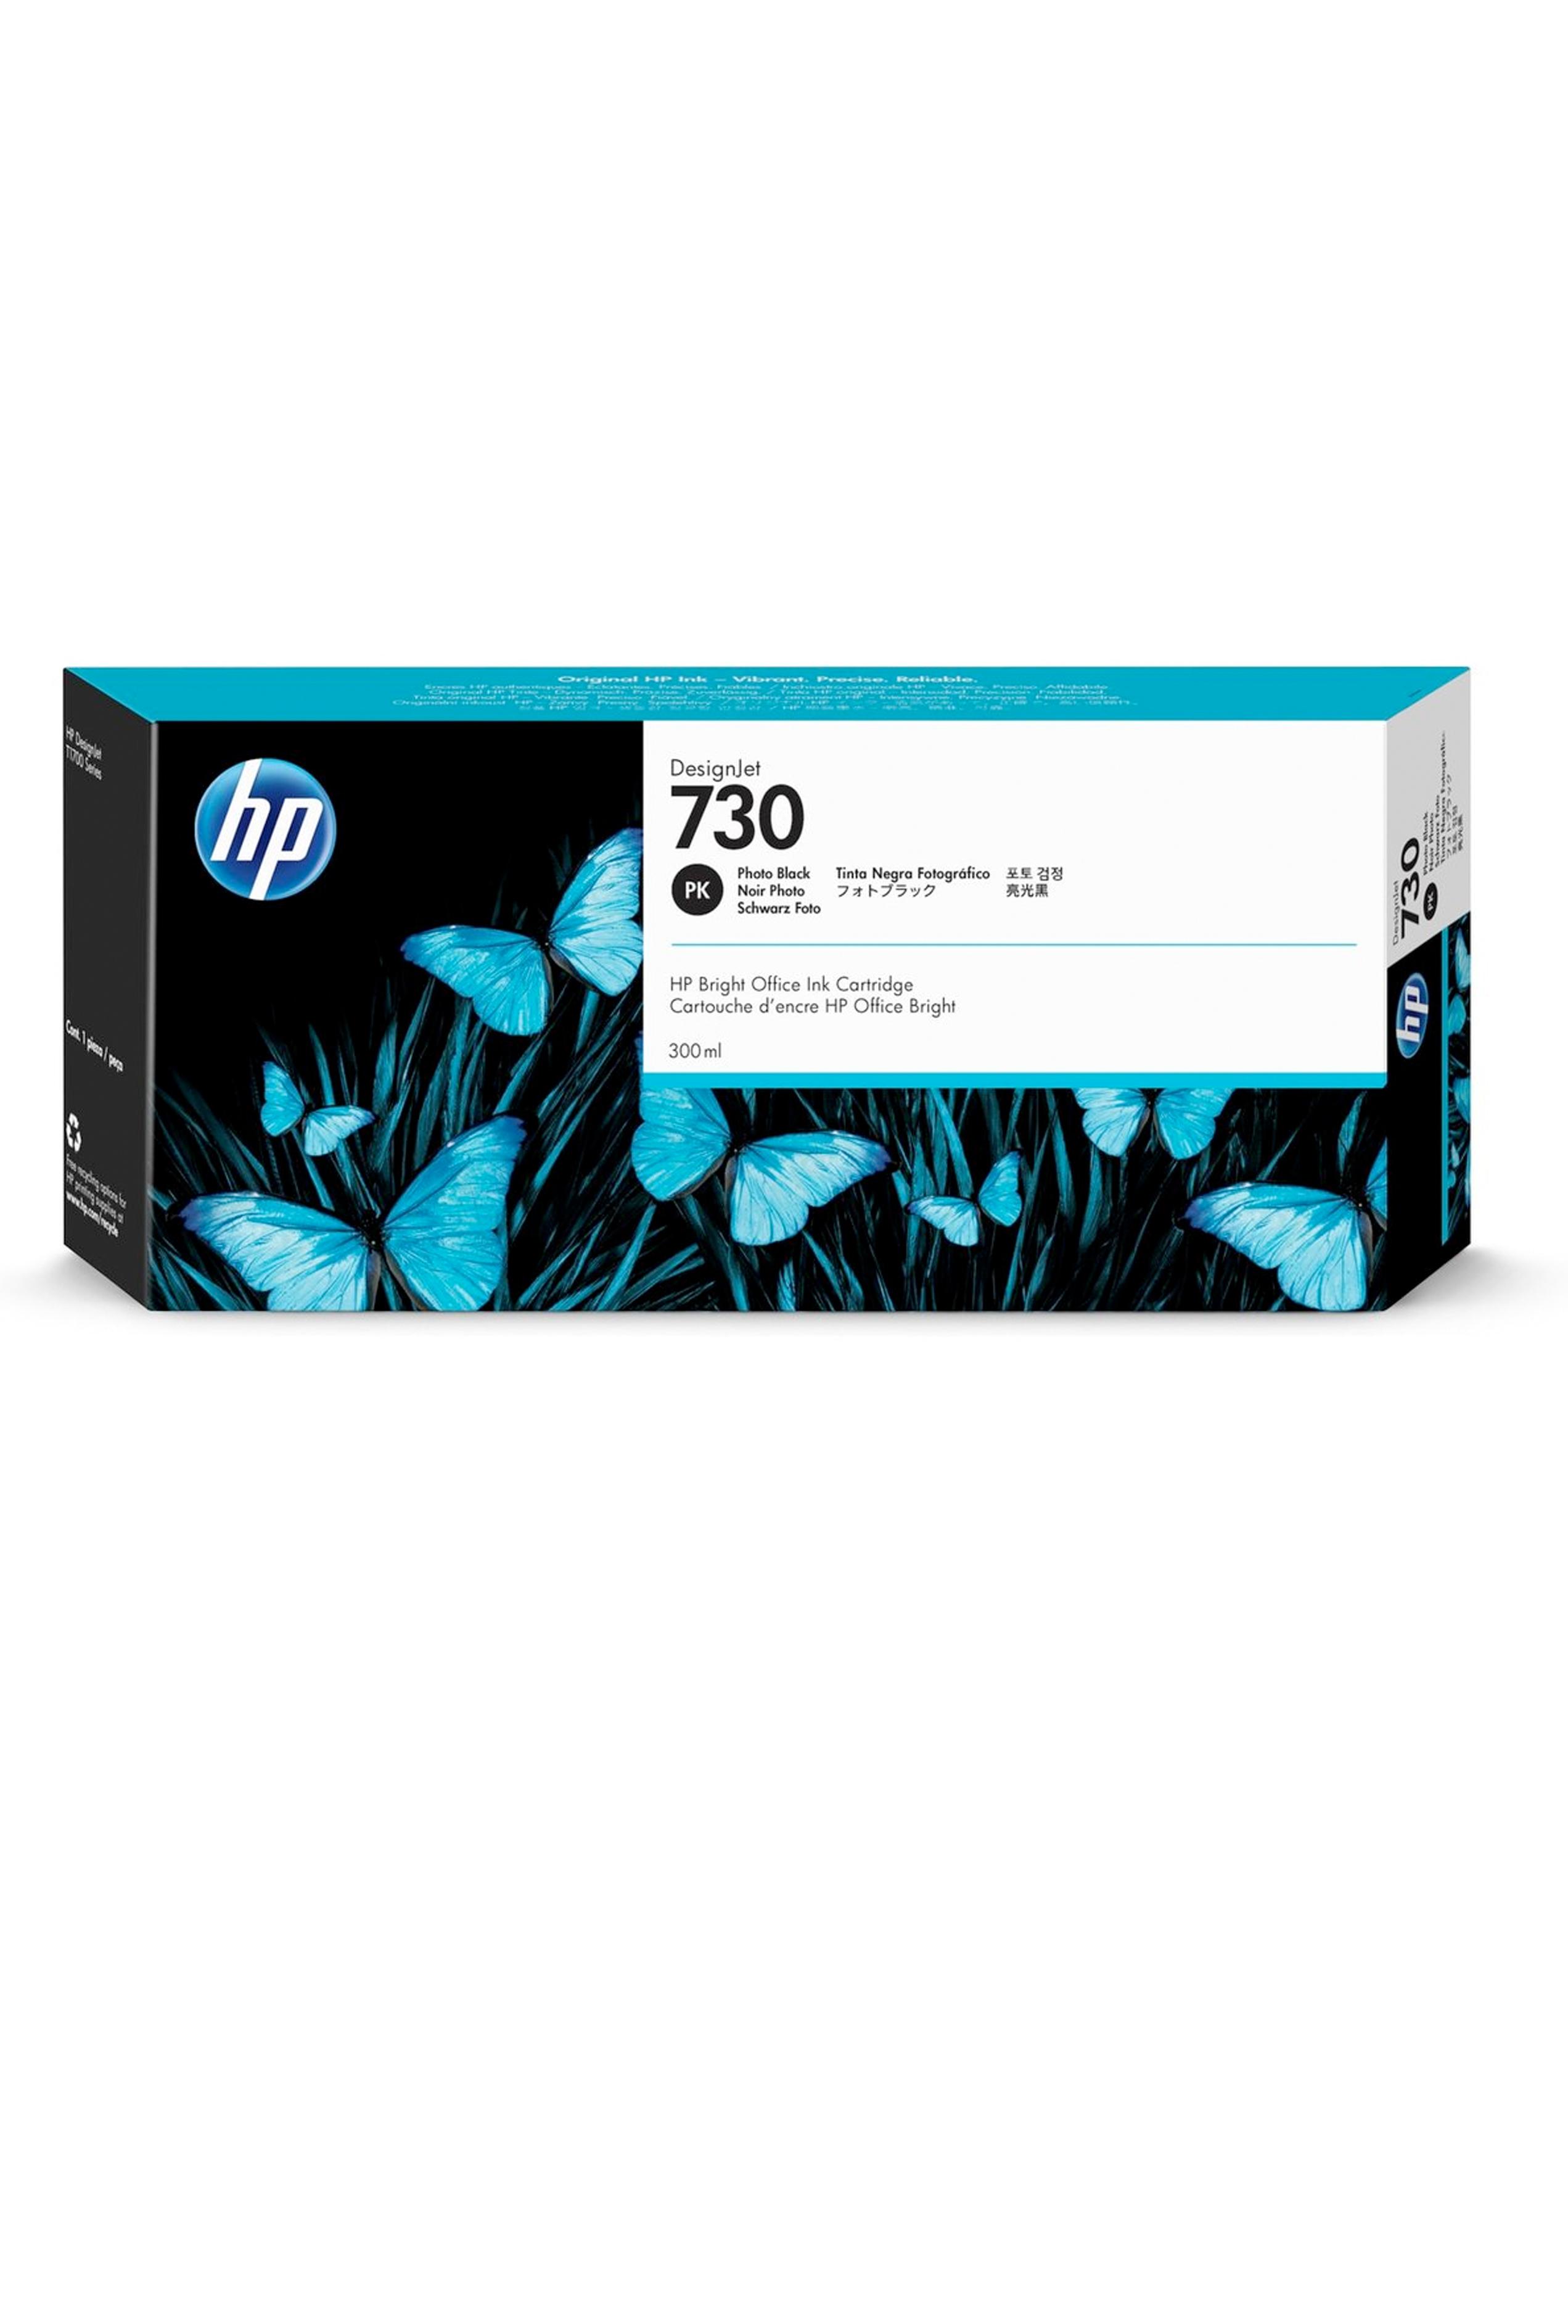 HP 730 300-ml Photo Black DesignJet Ink Cartridge (P2V73A)